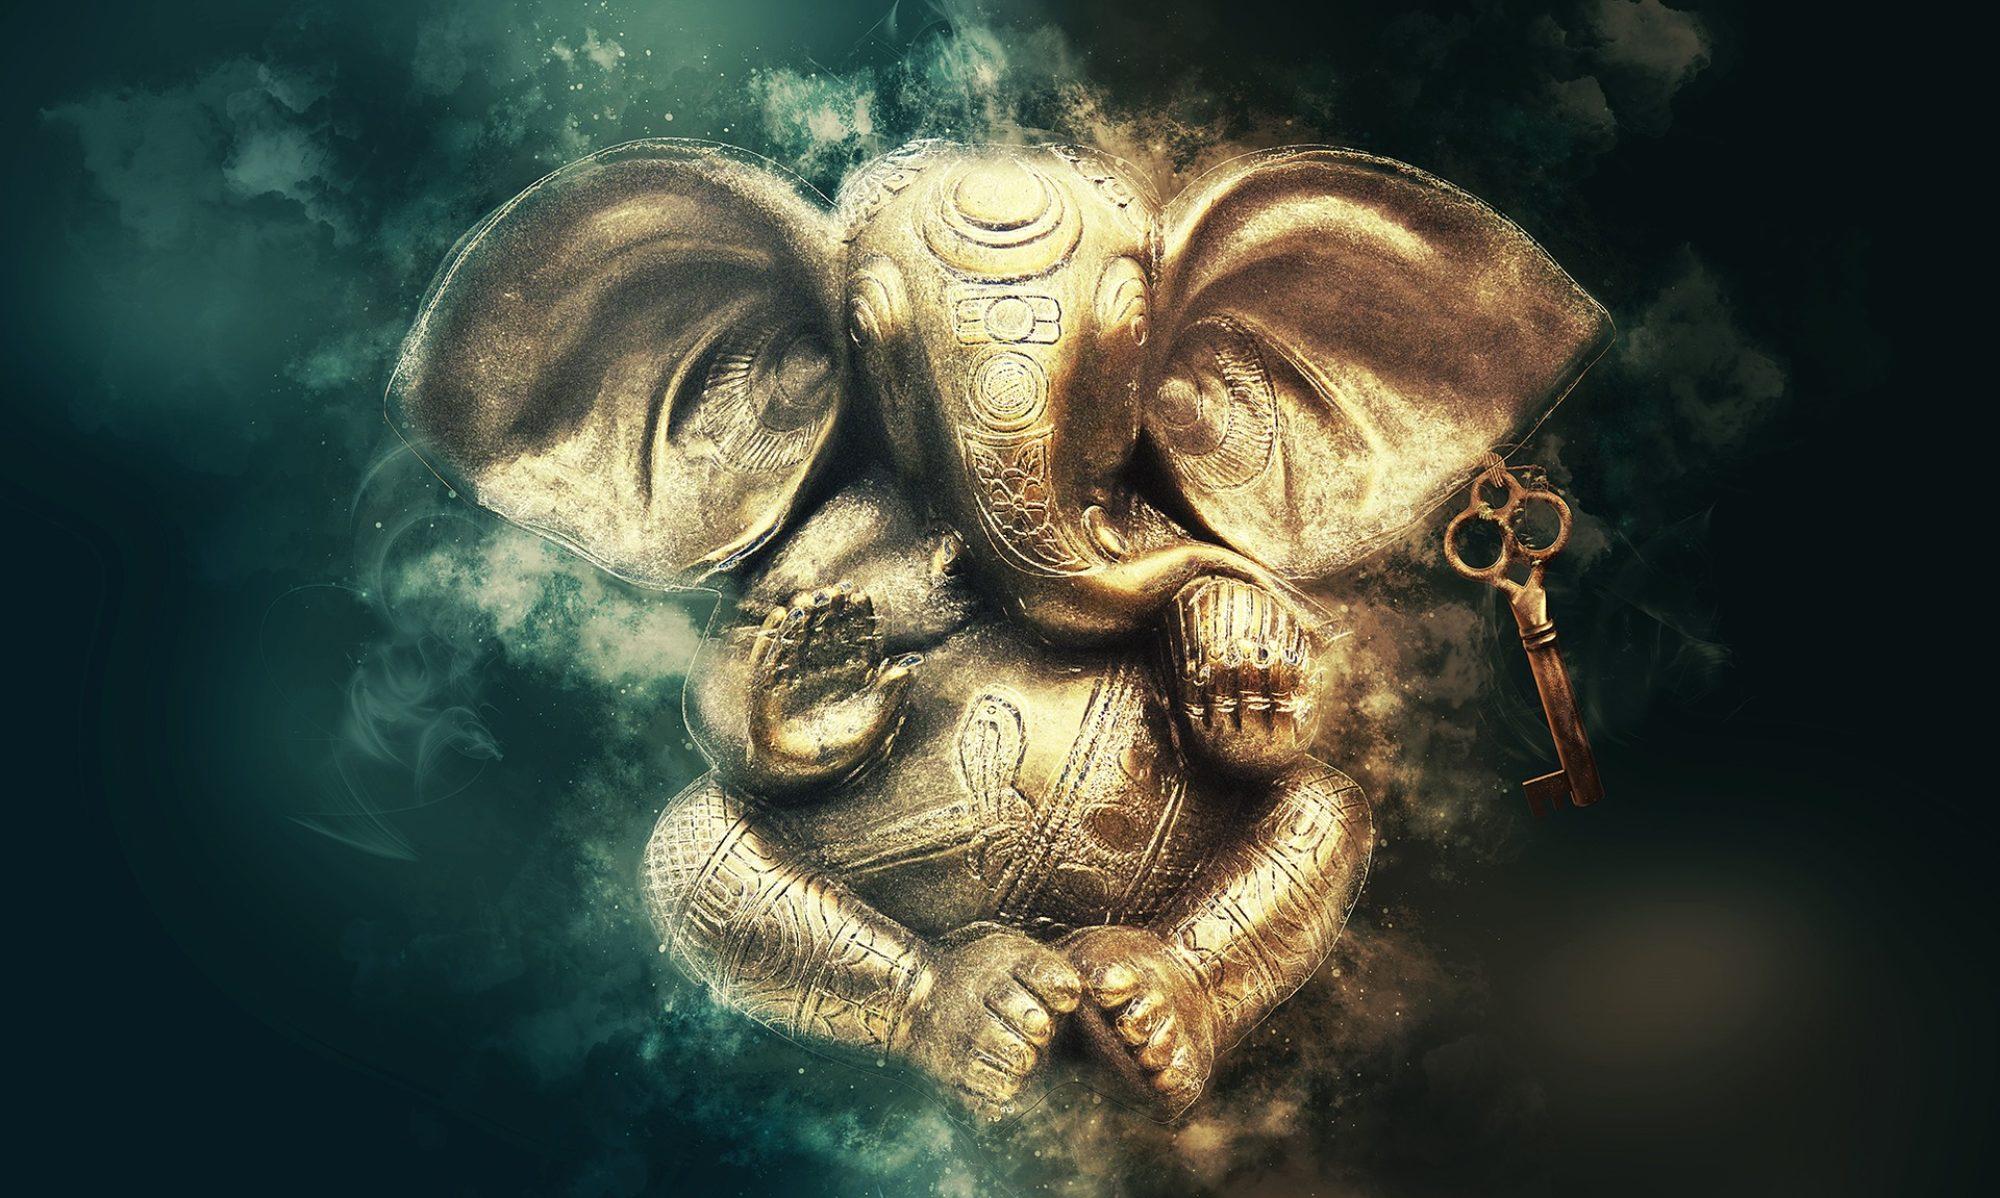 Ganesha Yogastudio